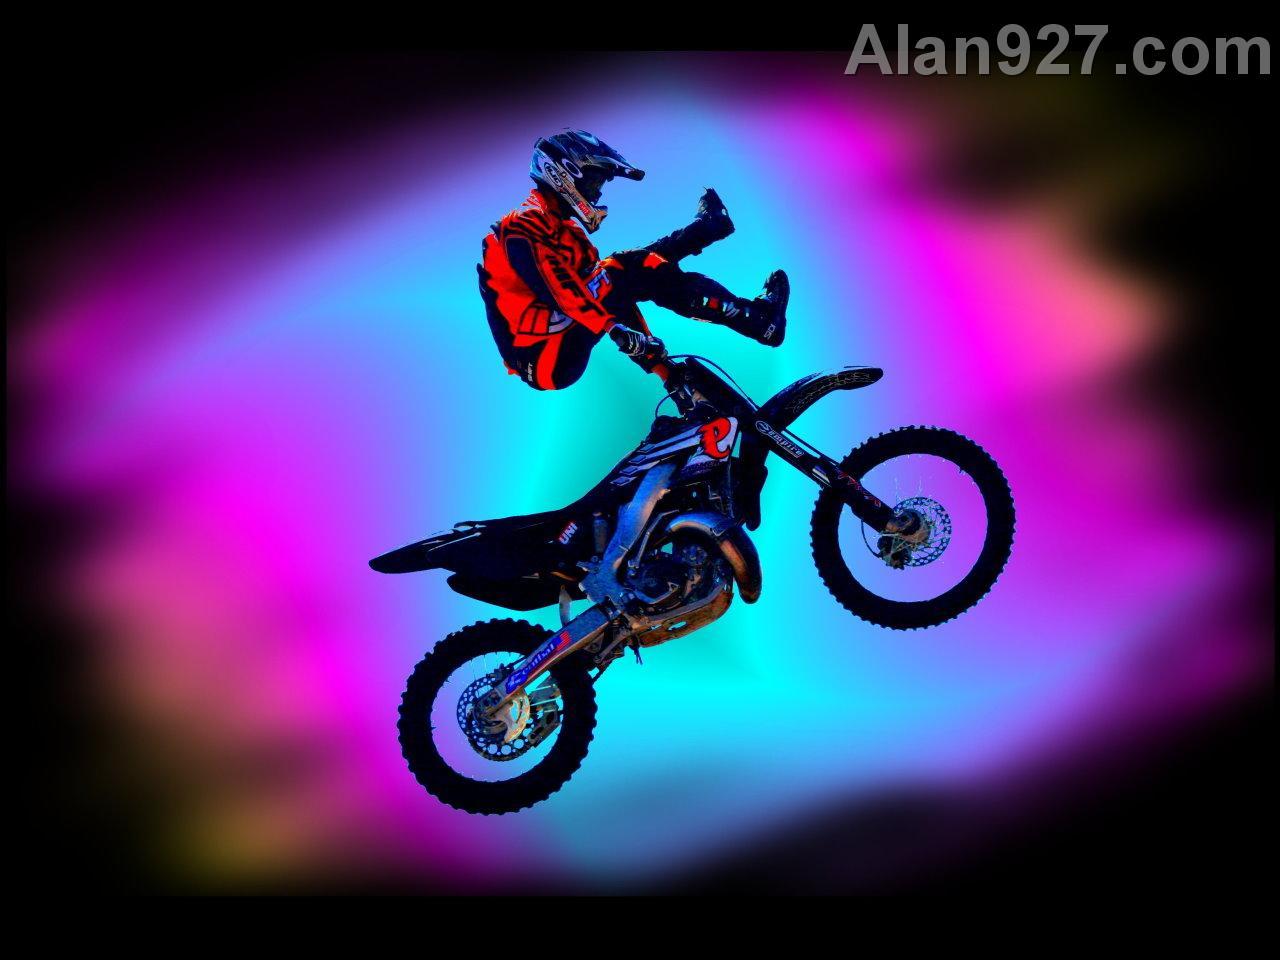 Wallpapers de Motocross - Taringa!